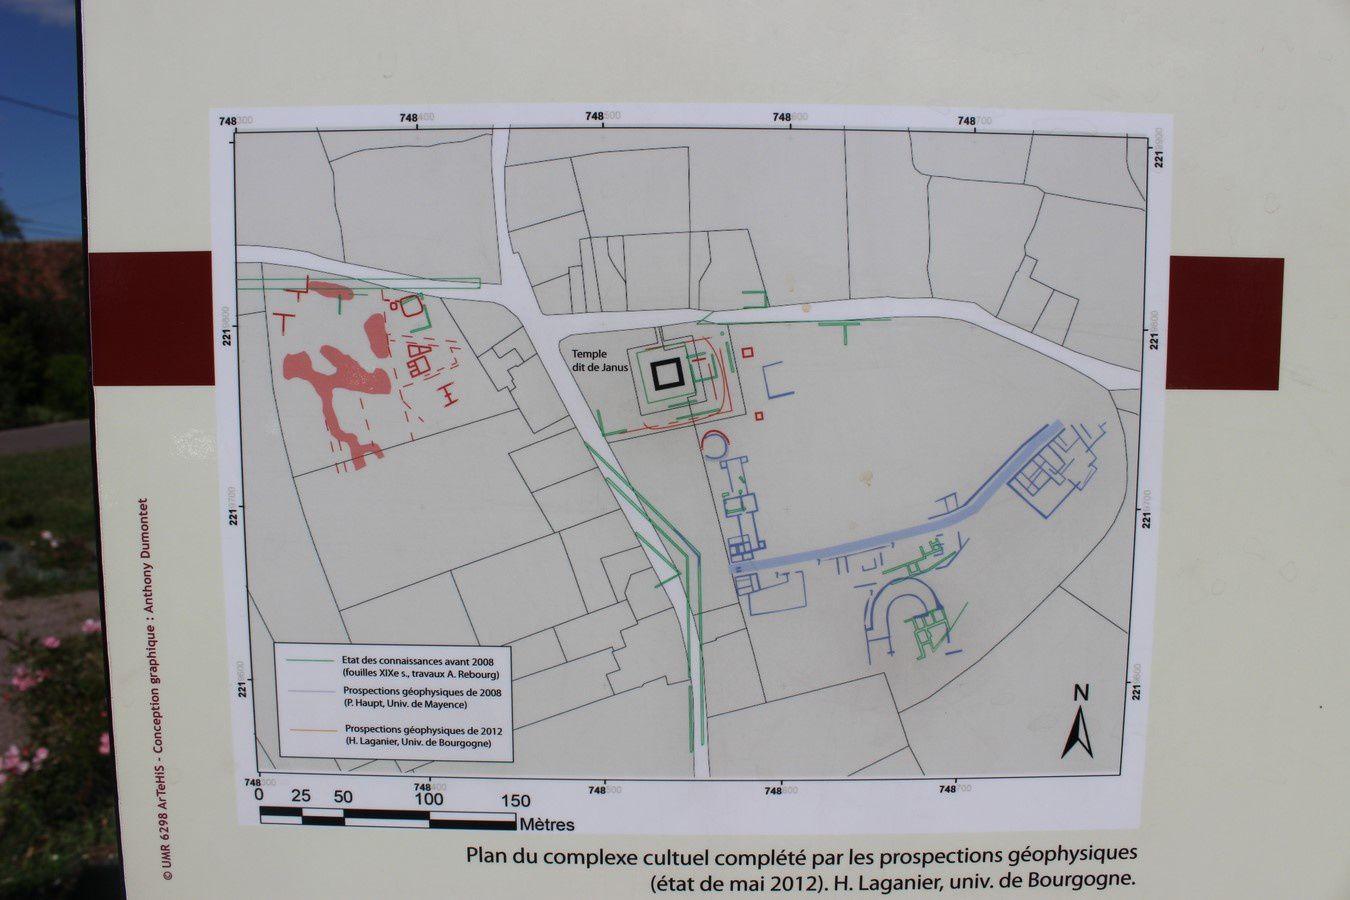 Route de la Genetoye - 71400 Autun ¤¤¤ Quartier Saint-Andoche ¤¤¤